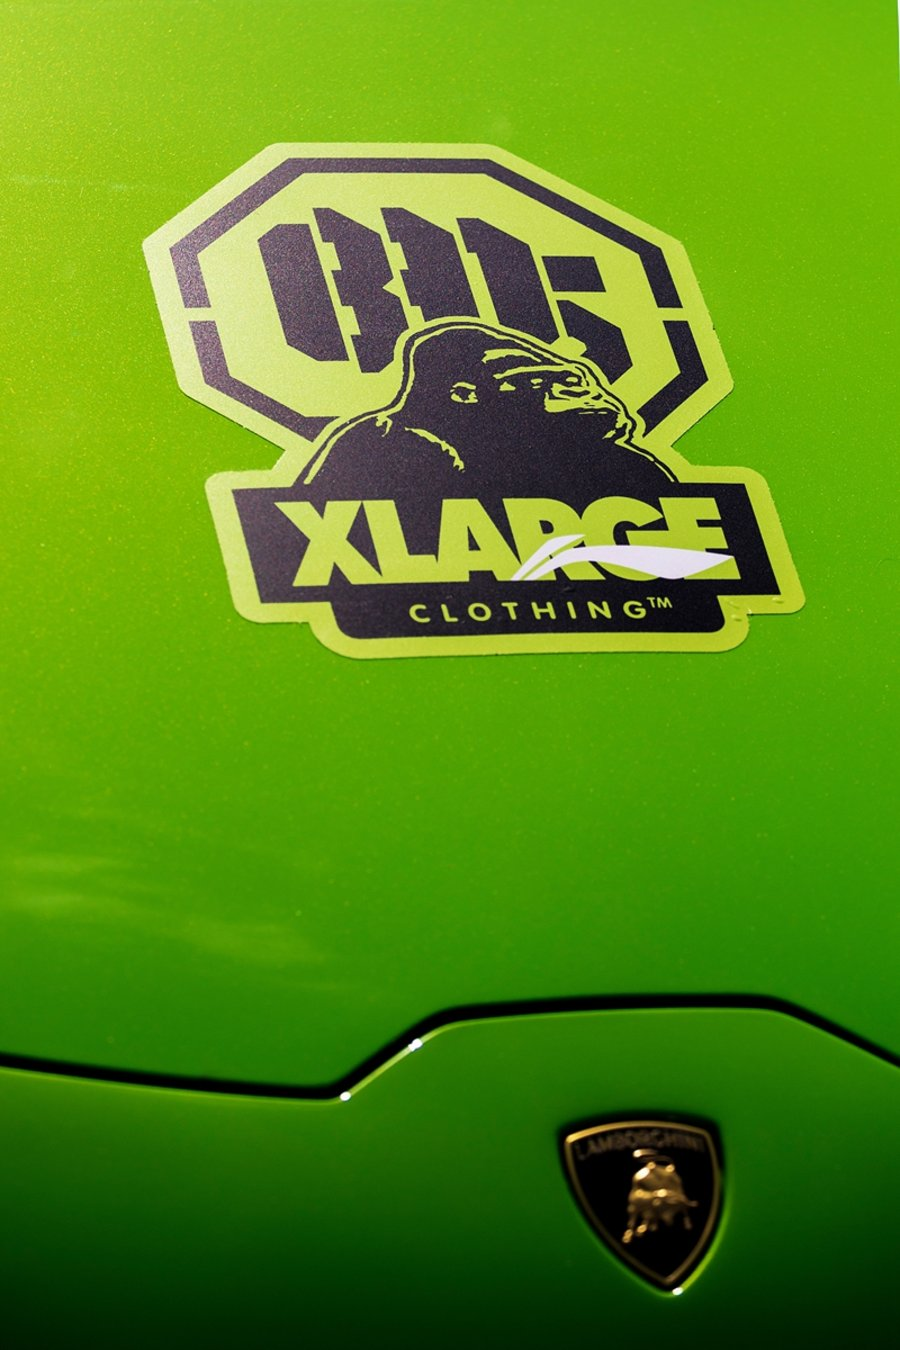 XLARGE,李宁,BADFIVE  顶级街头潮牌联名!除了走秀款,李宁还有这个必买系列!